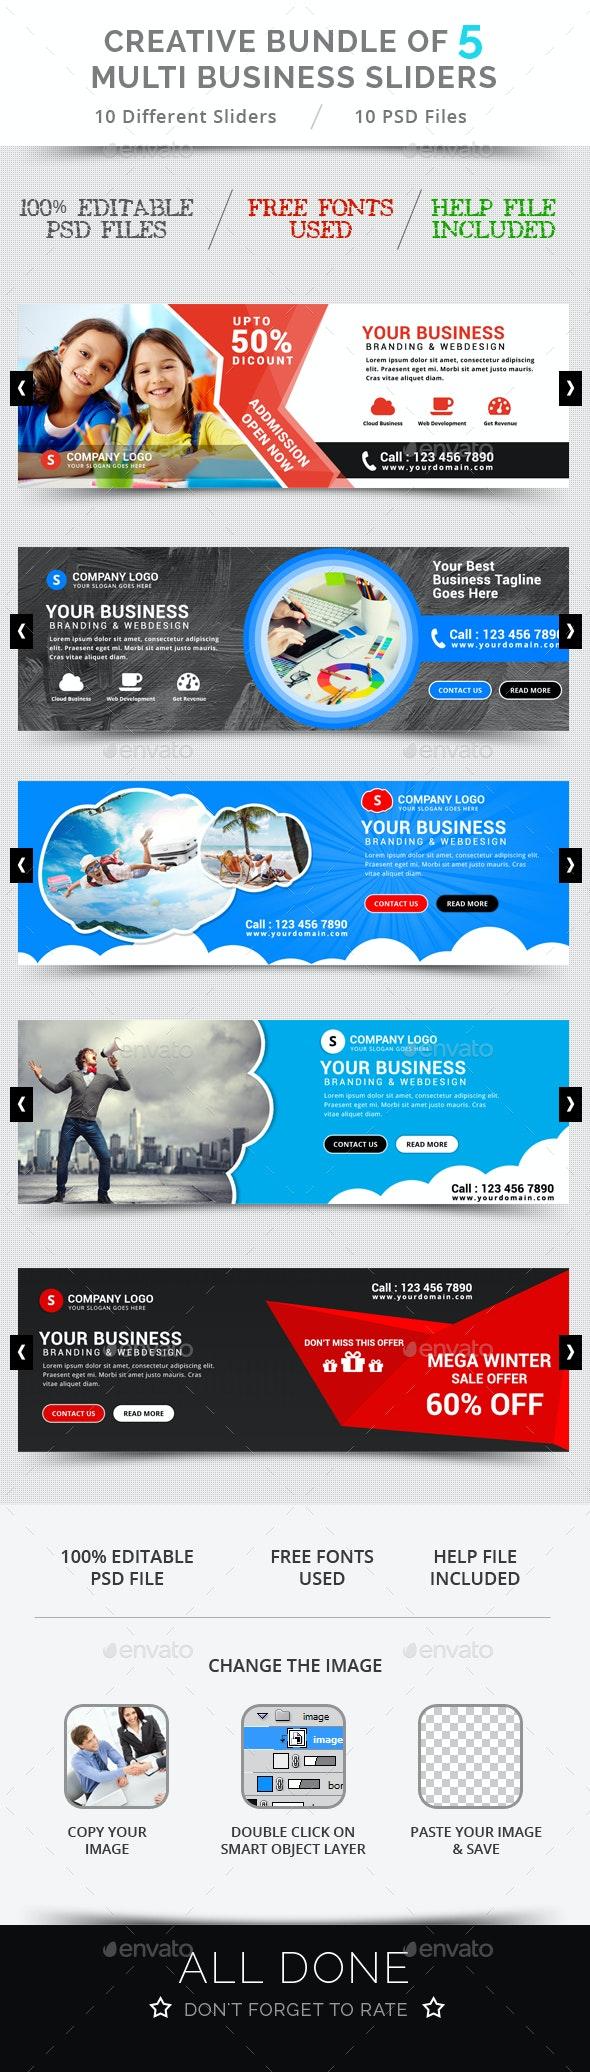 Bundle of 5 Creative Business Sliders - Sliders & Features Web Elements